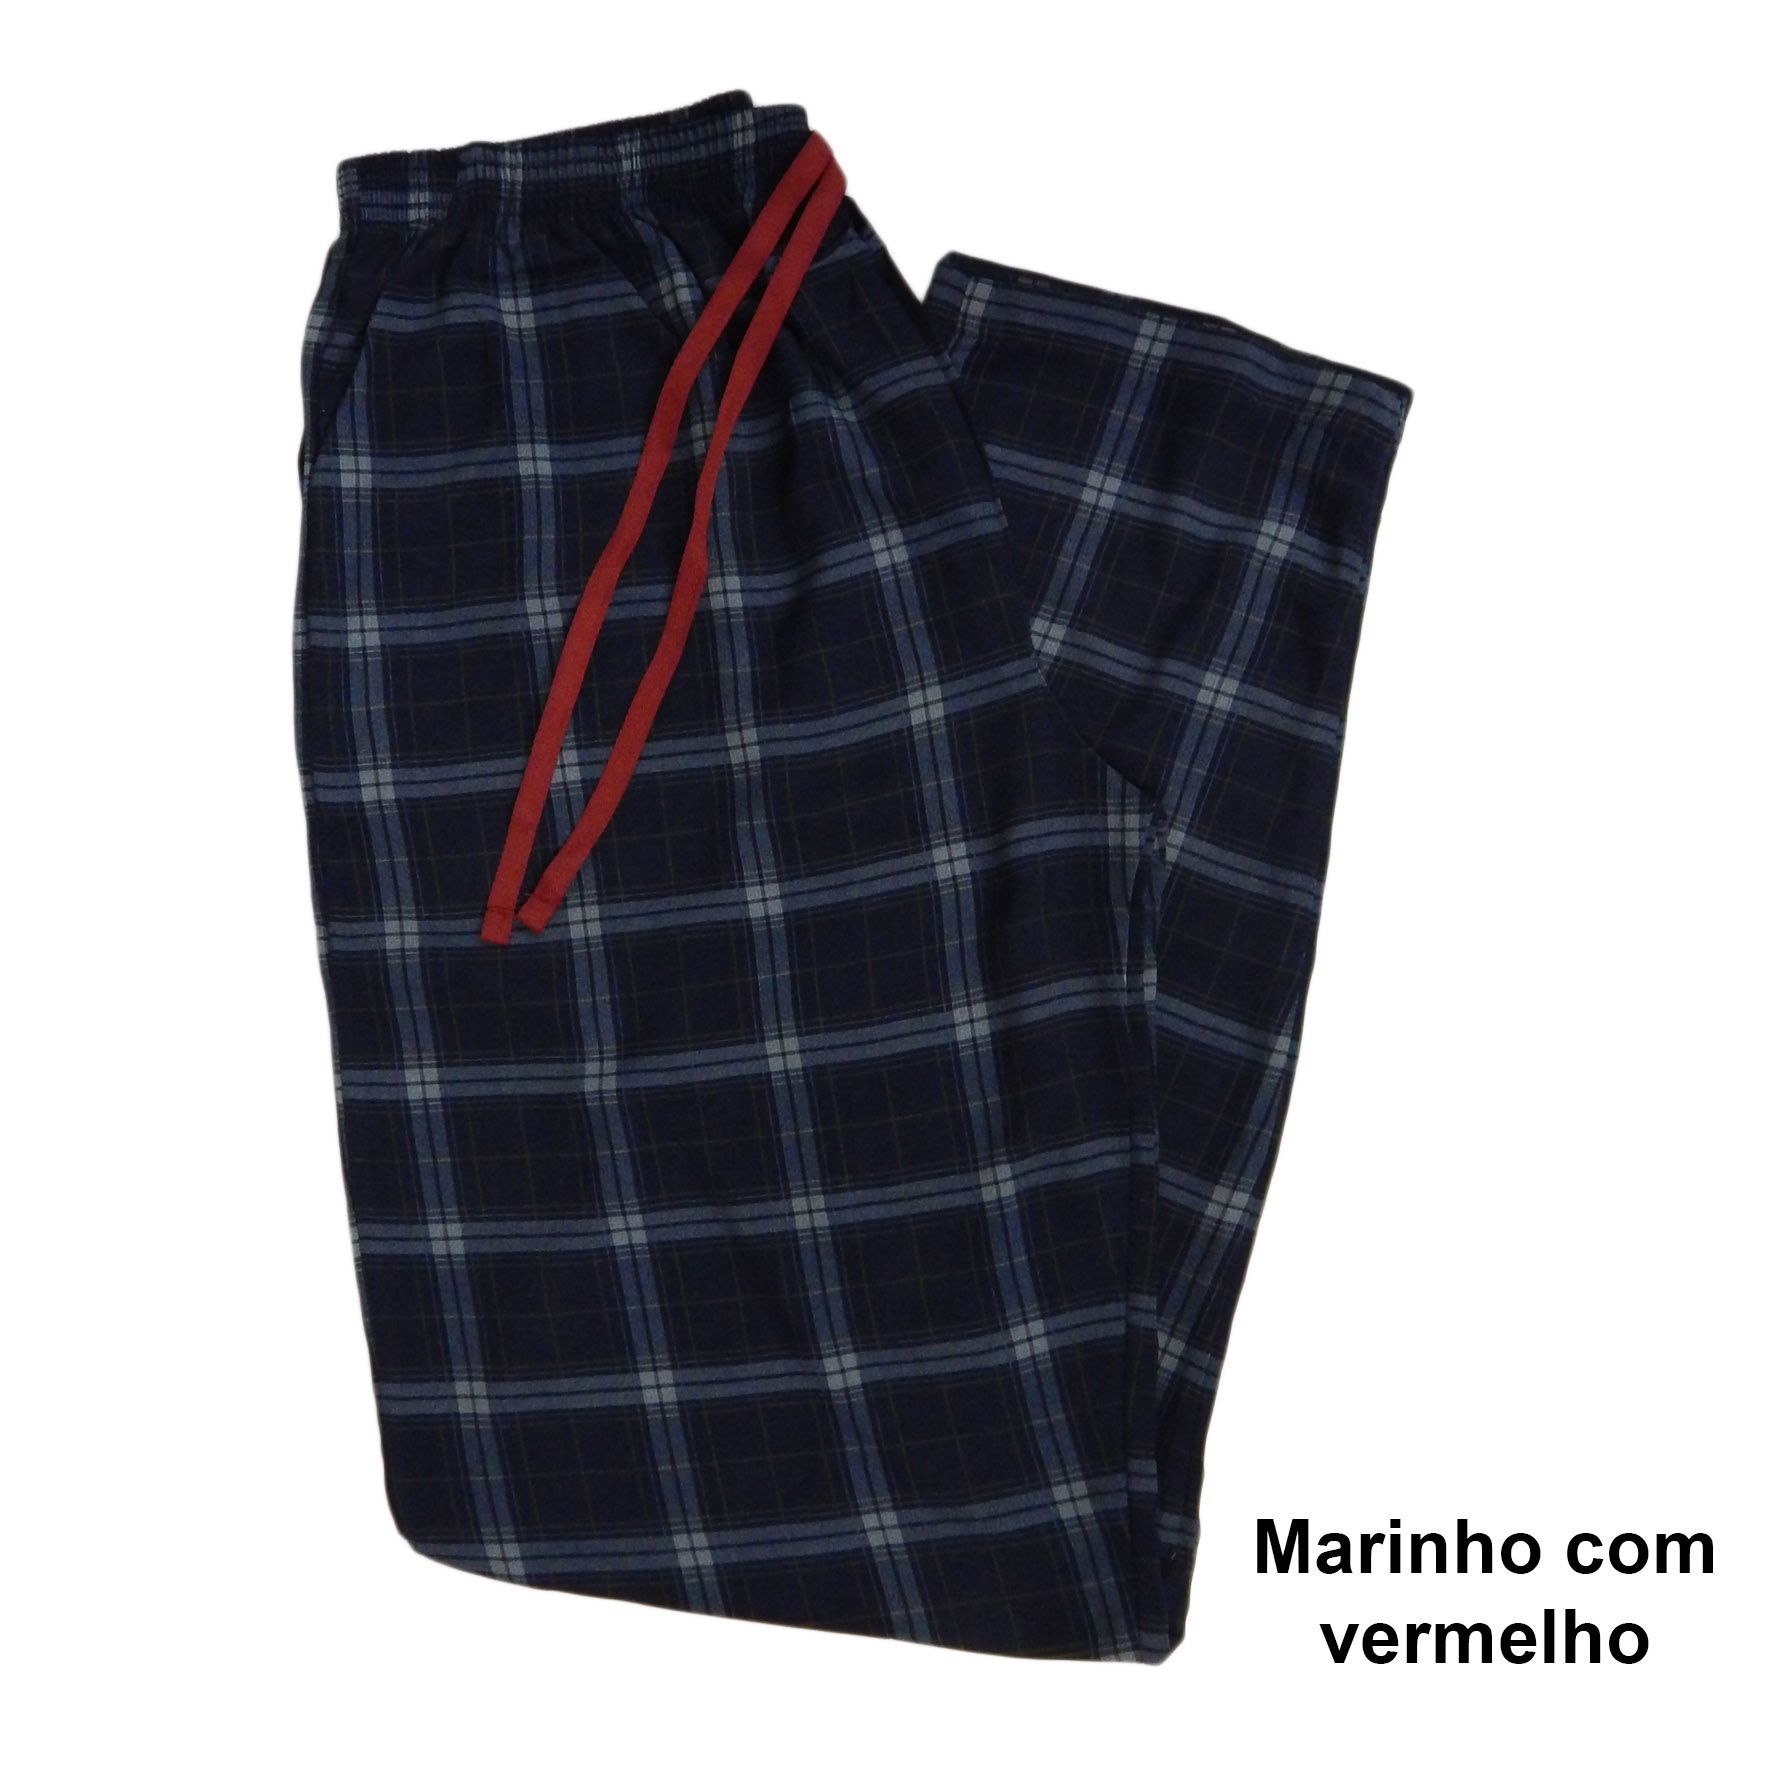 Calça Feminina Avulsa Viscose Molinha Xadrez Foxx 263297